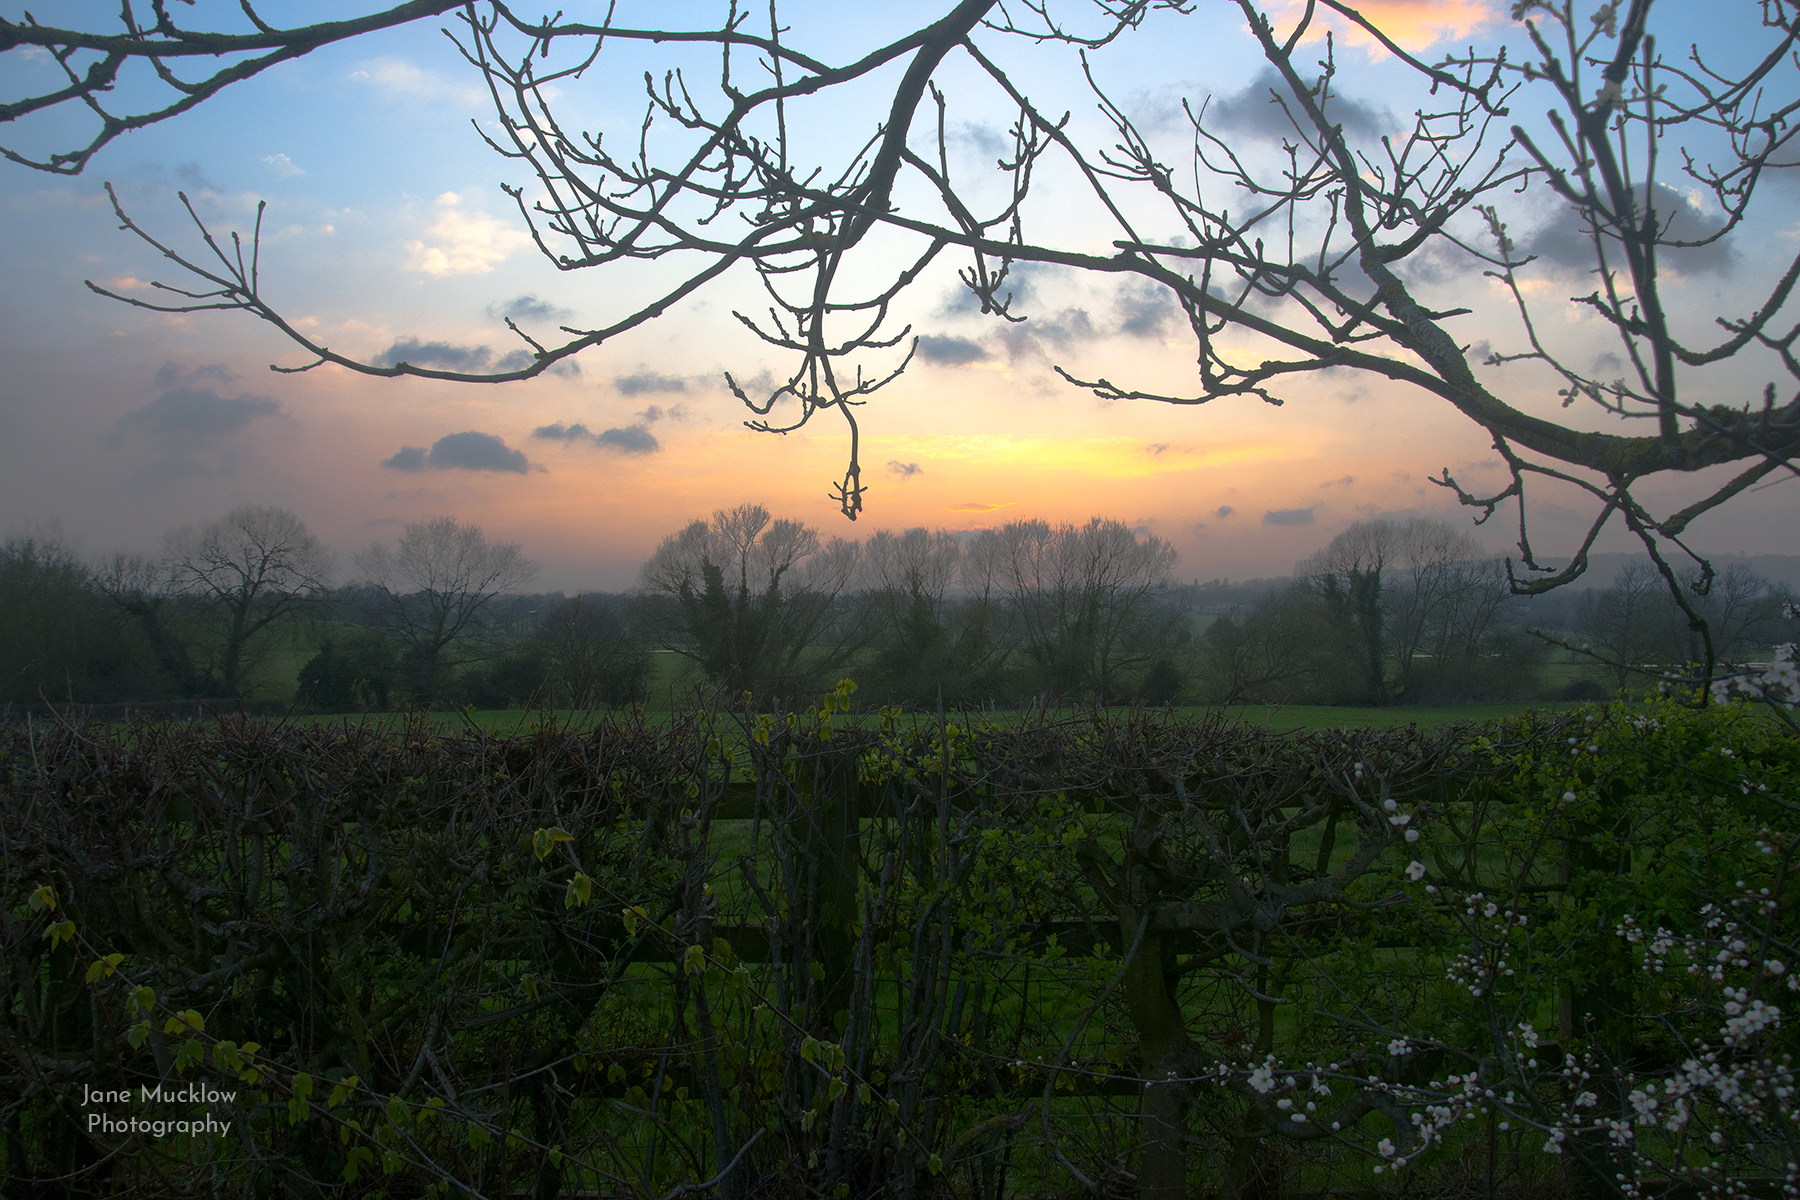 Photograph of sunset, fields near Sevenoaks, by Jane Mucklow